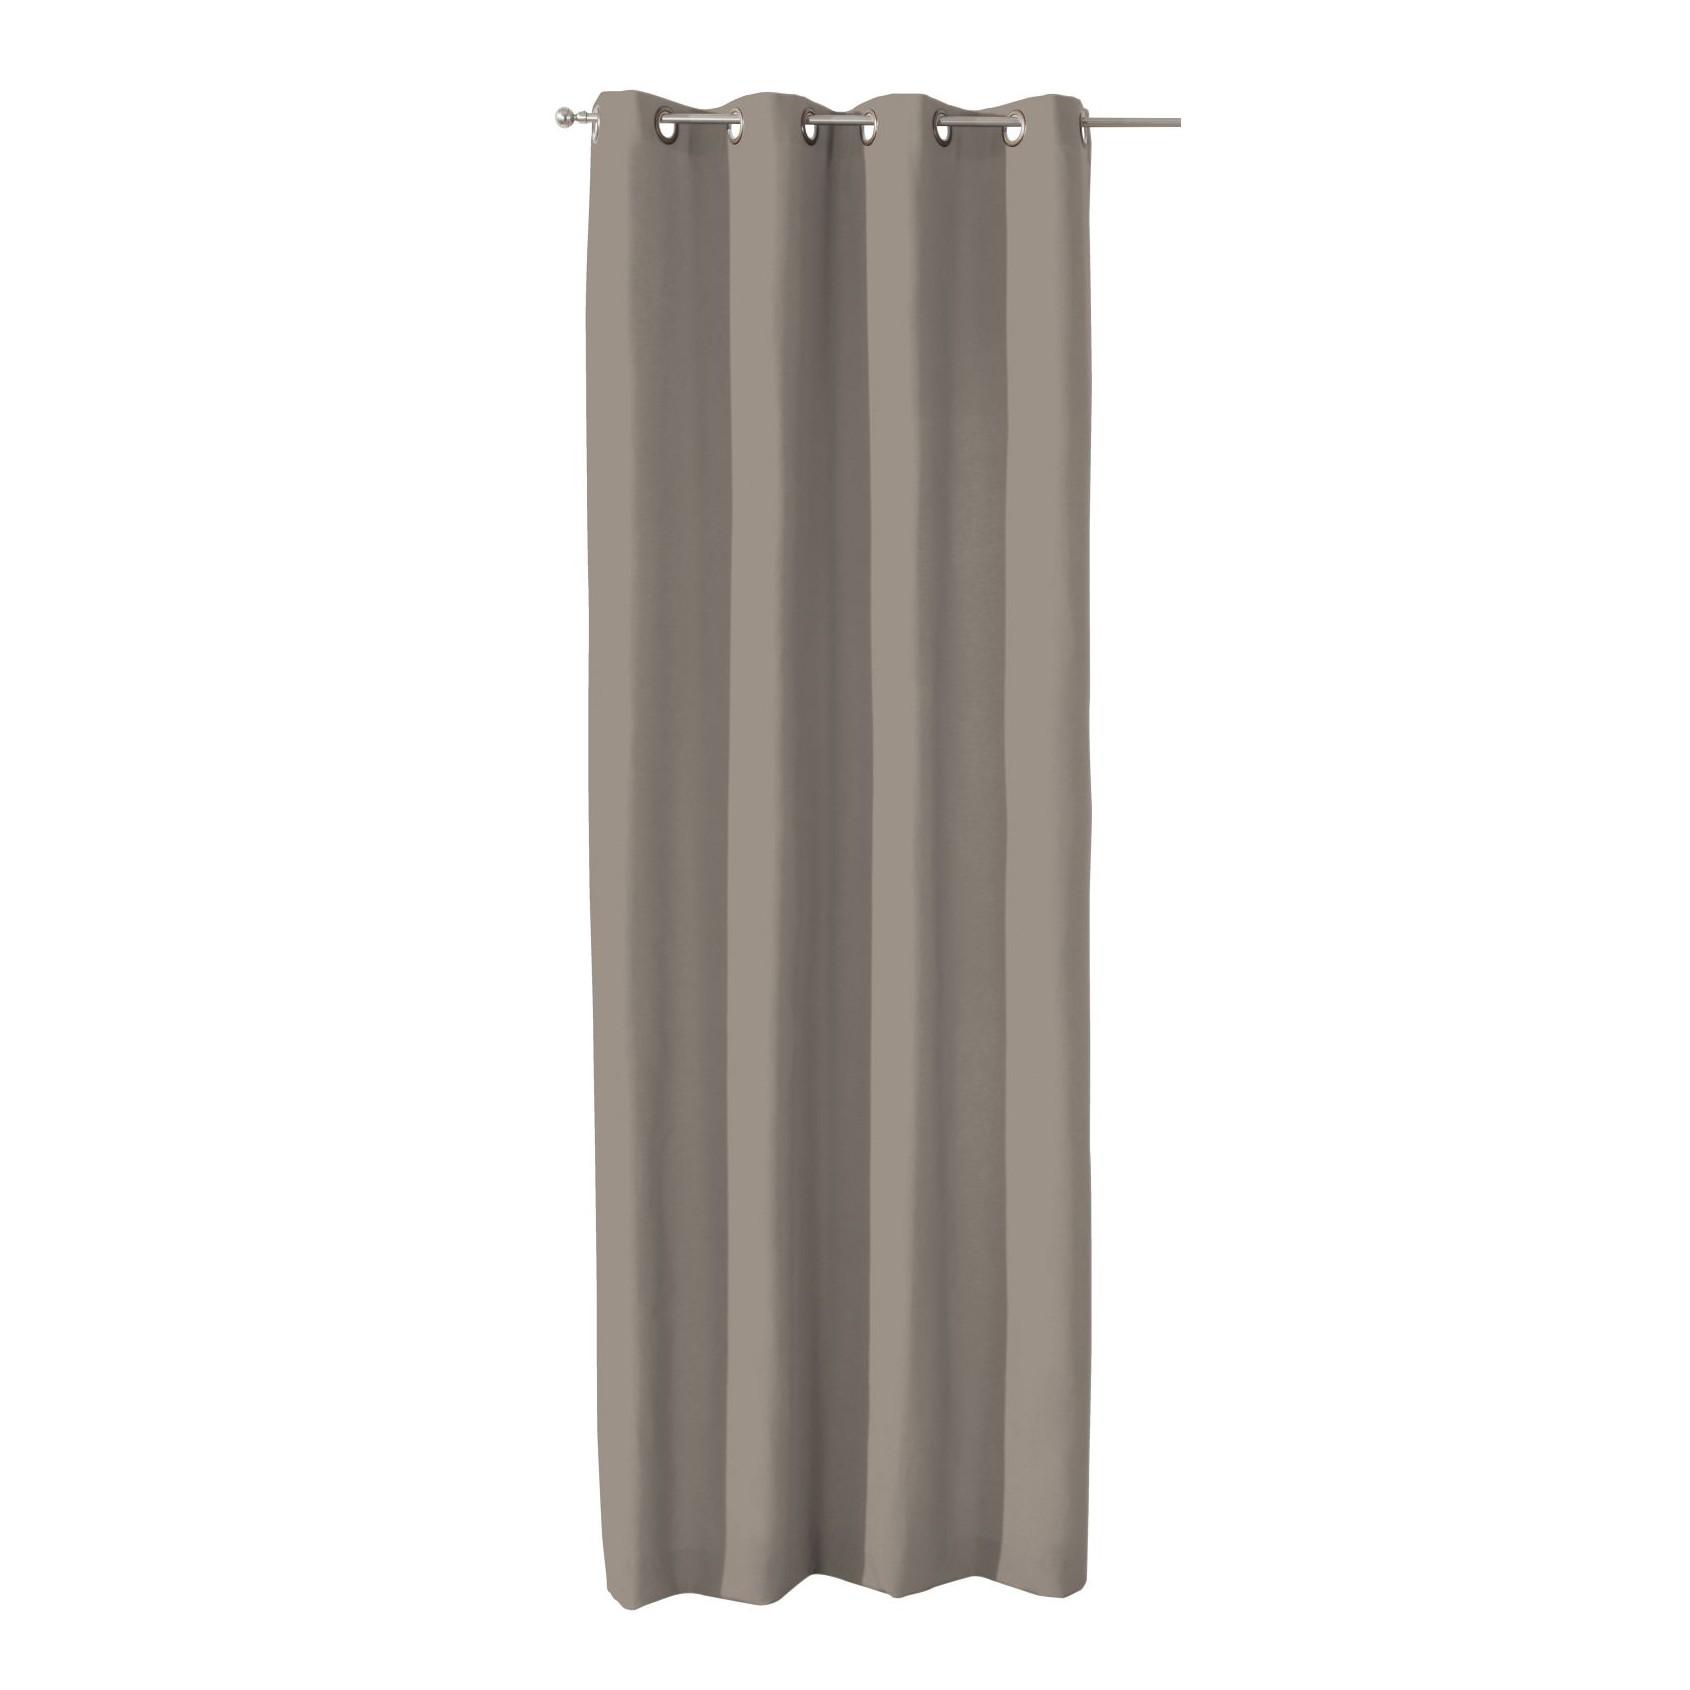 Home 24 - Rideau à ?illets occultant - marron clair - 130 x 310 cm, dekoria